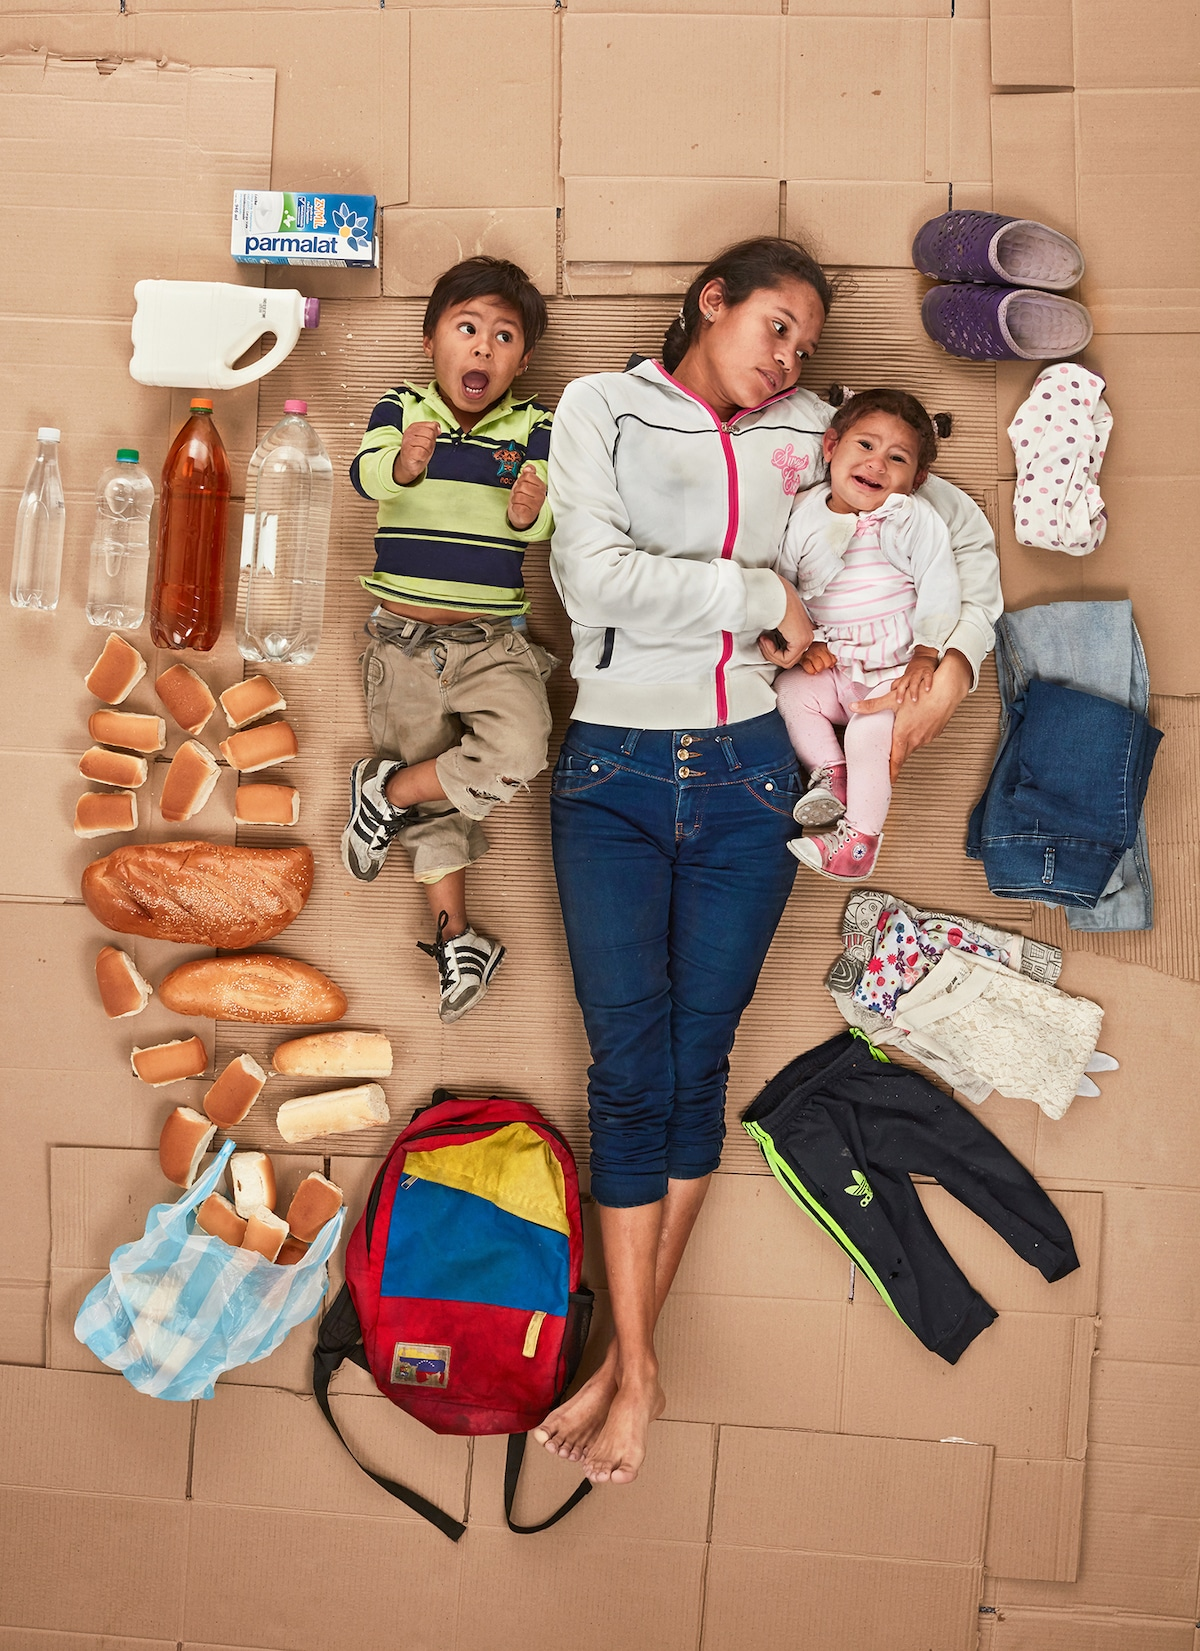 Photograph of Venezuelan Refugee Family by Gregg Segal